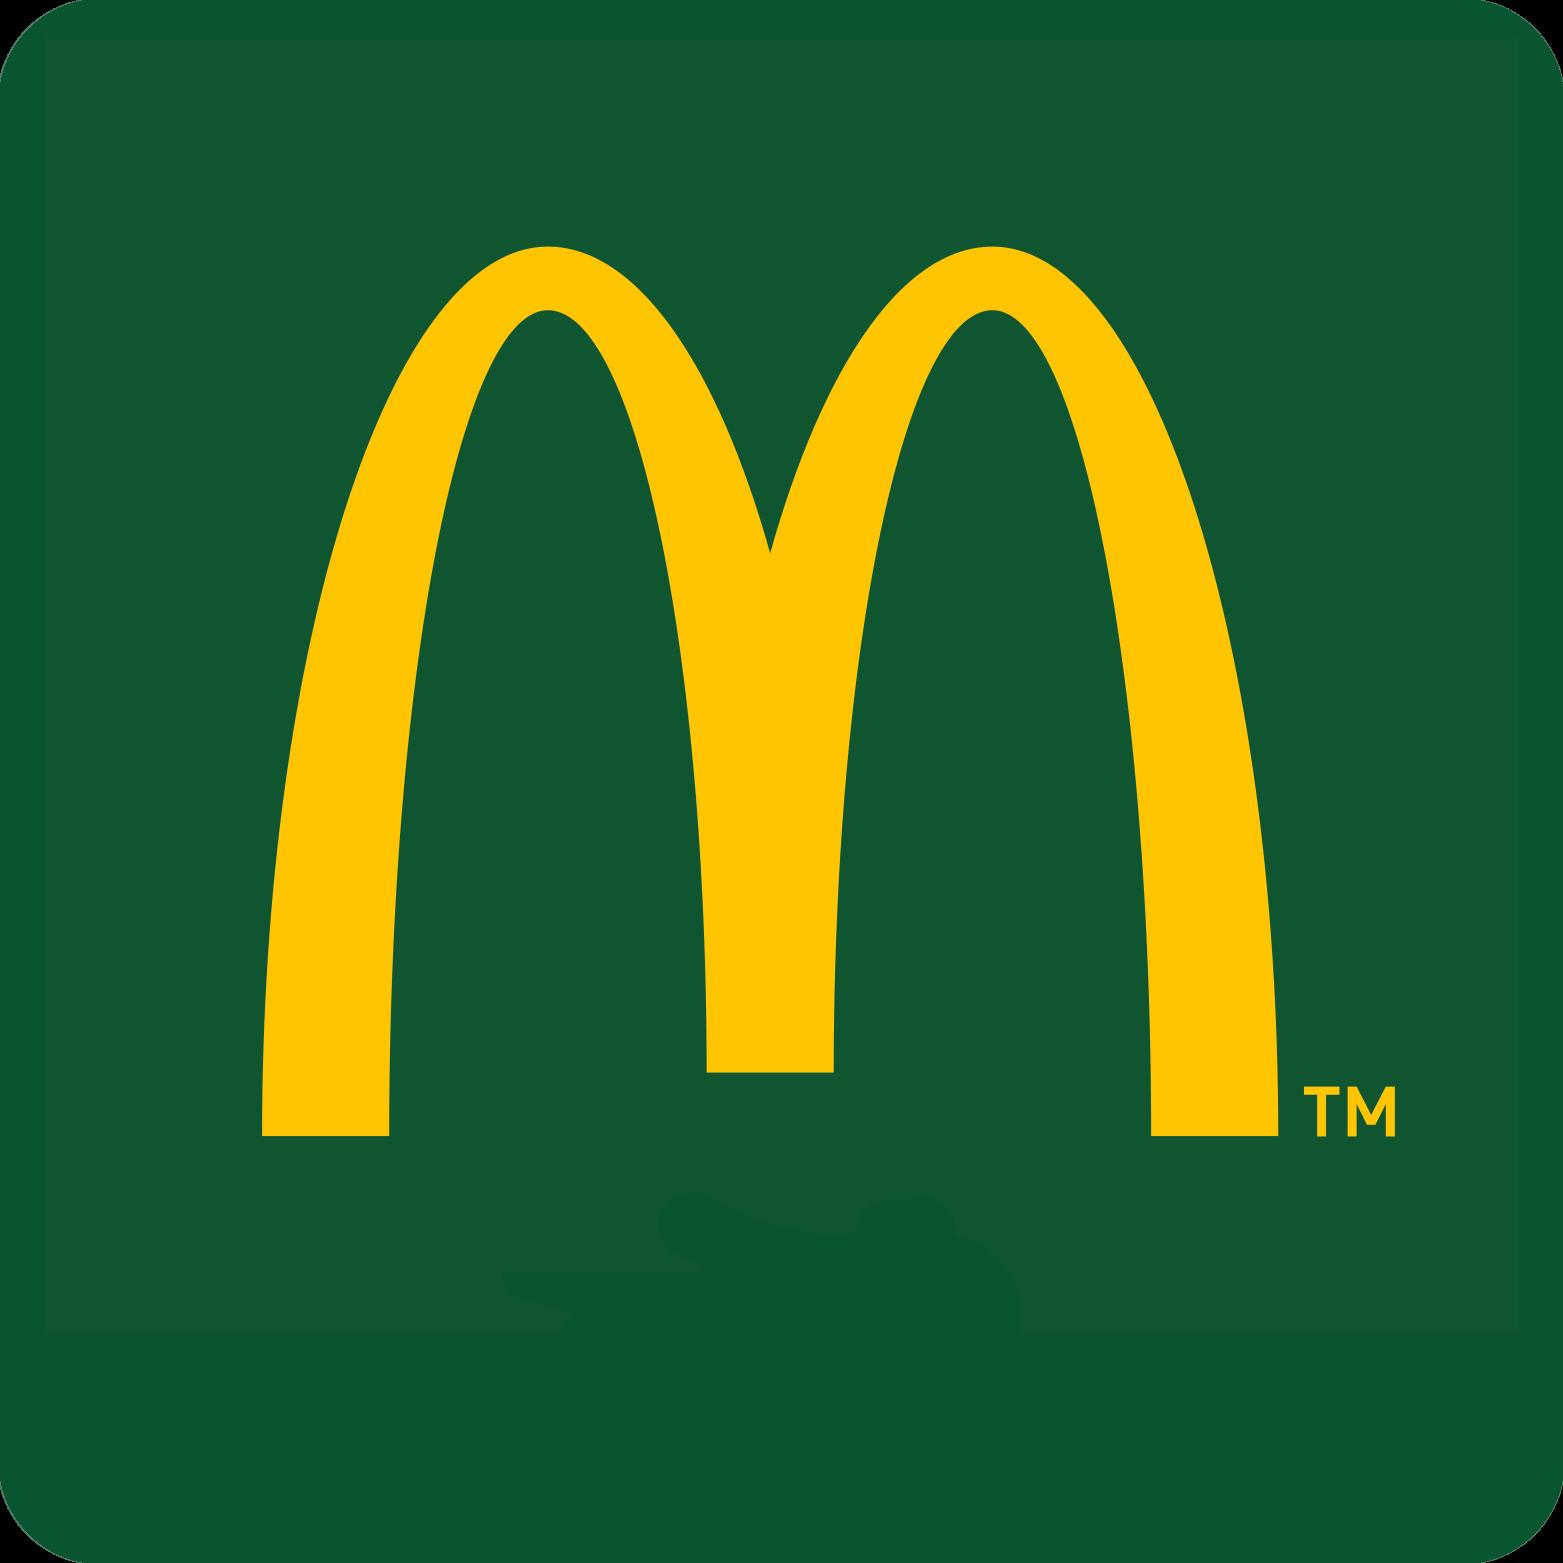 McDonald's Rochefort | McDonald's Surgeres | McDonald's Rochefort Sud | McDonald's Dolus d'Oléron